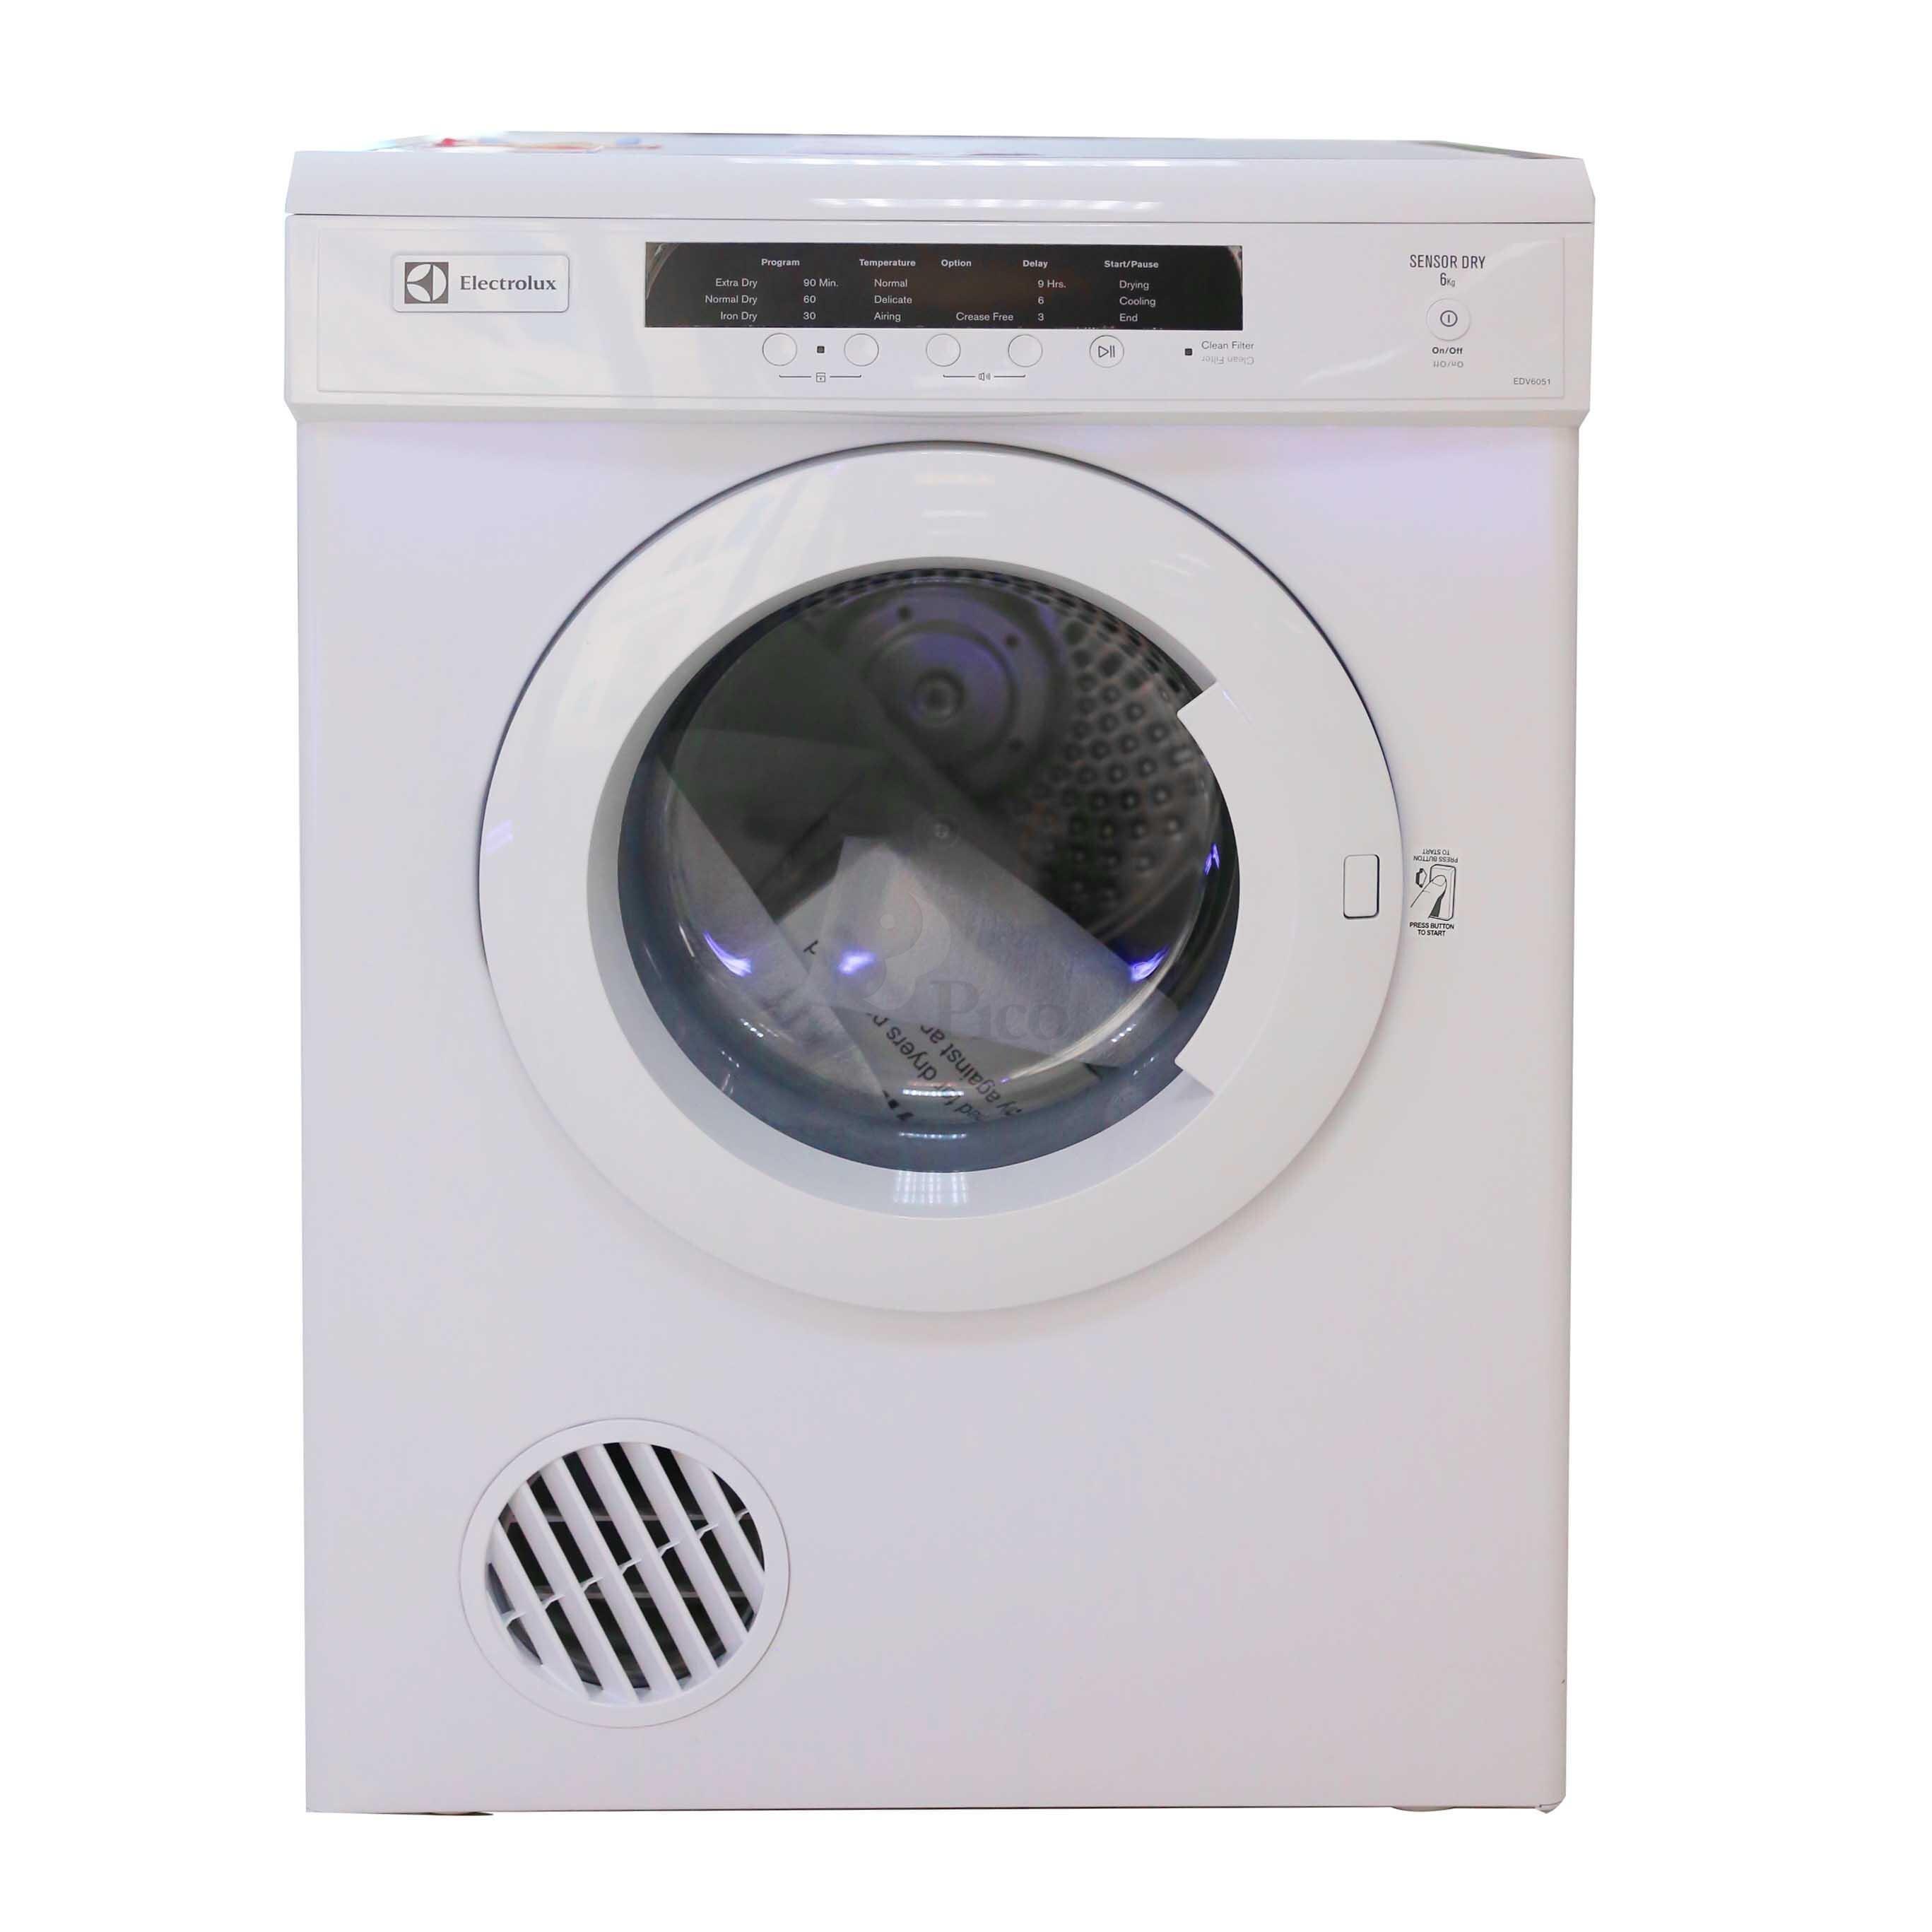 So sánh máy sấy quần áo Electrolux EDV7051 với Electrolux EDS7051